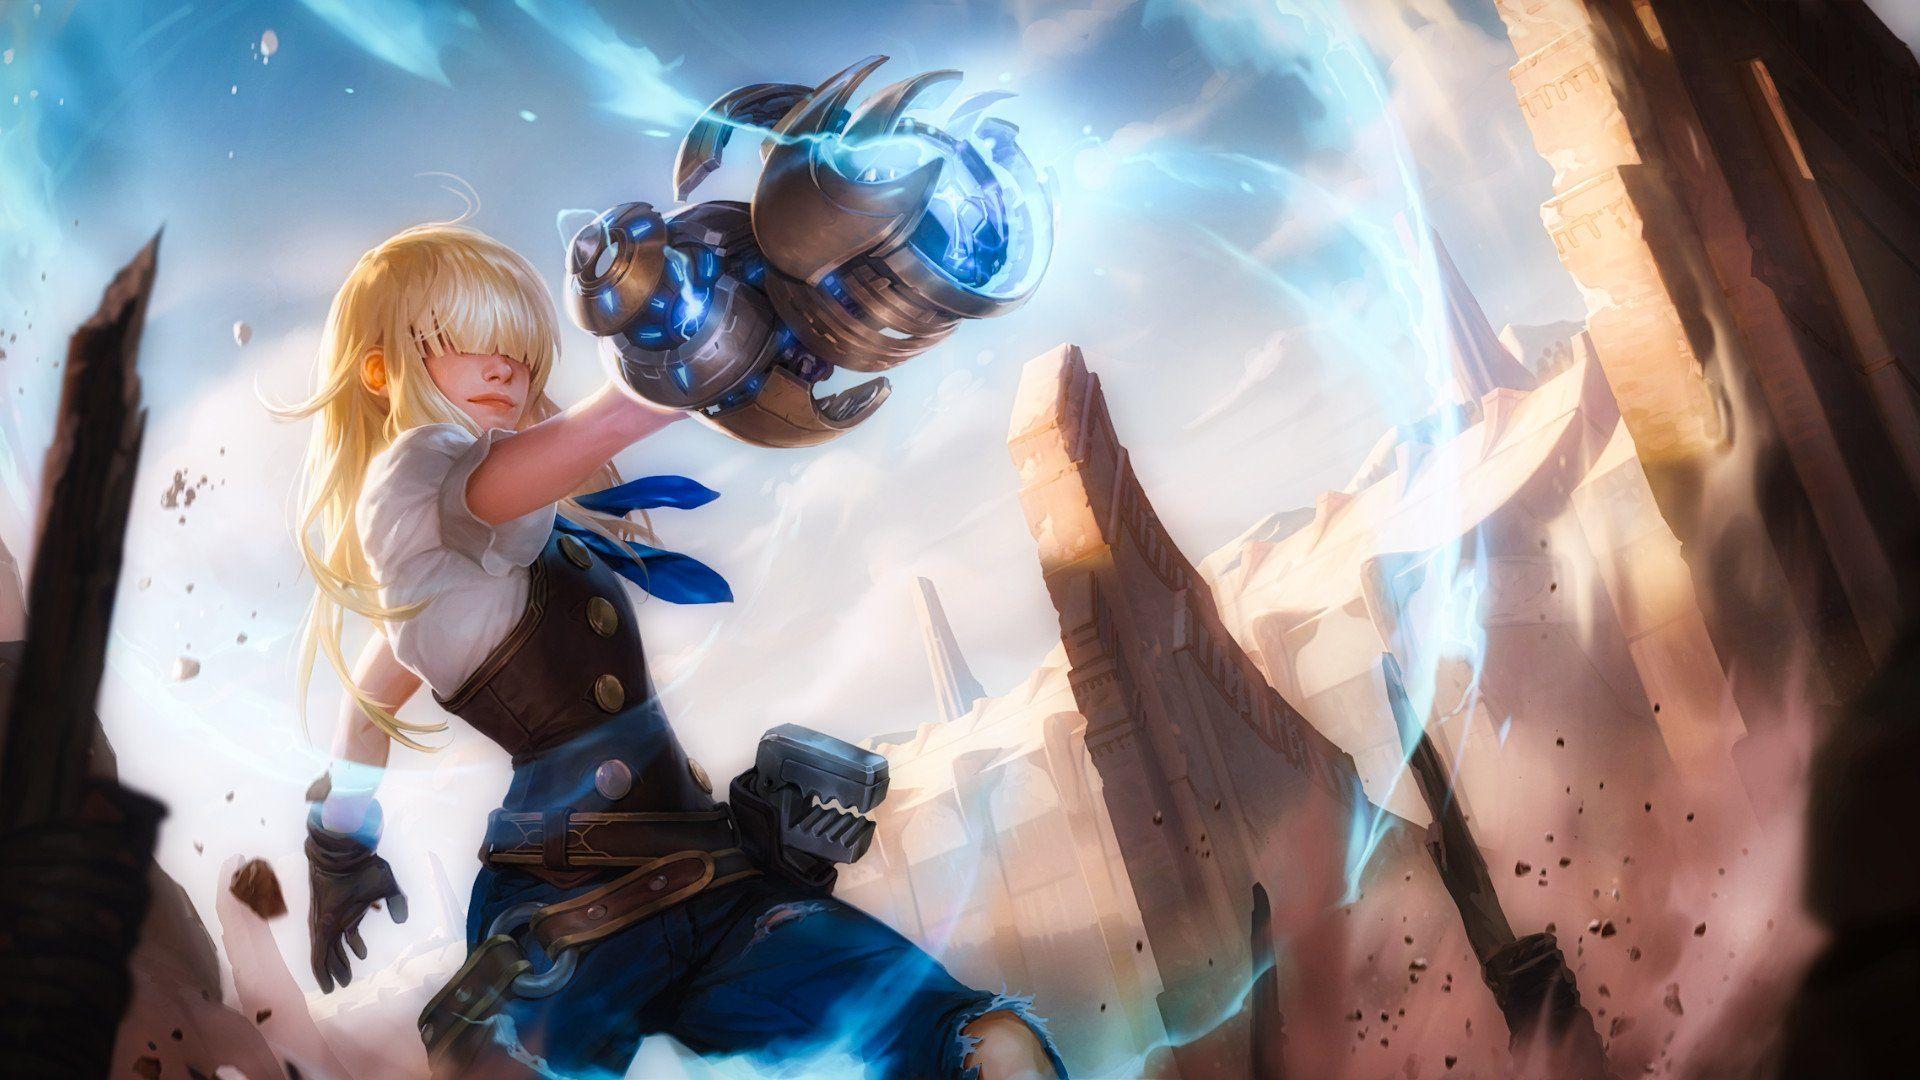 Legends Of Runeterra Wallpapers L2pbomb Character Art Desktop Wallpaper Illustration